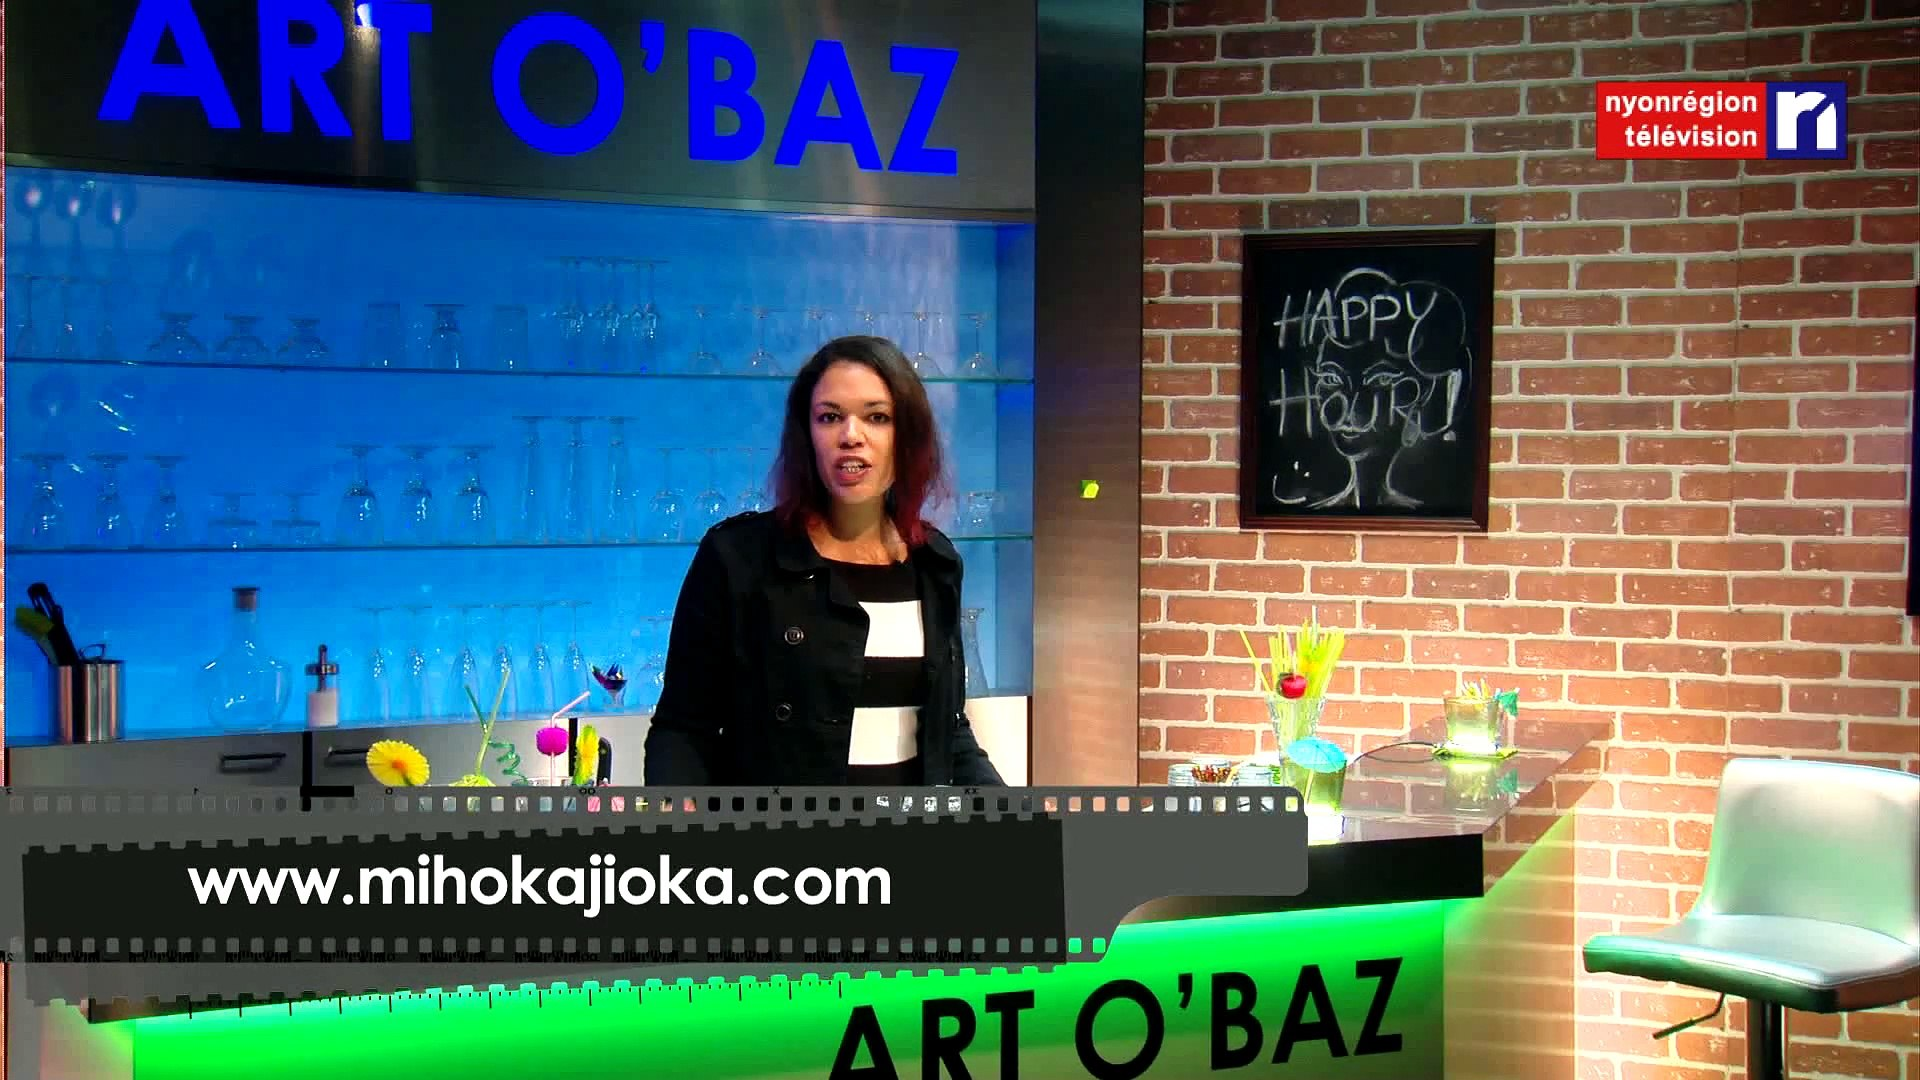 ART O'BAZ du 27 novembre 2014